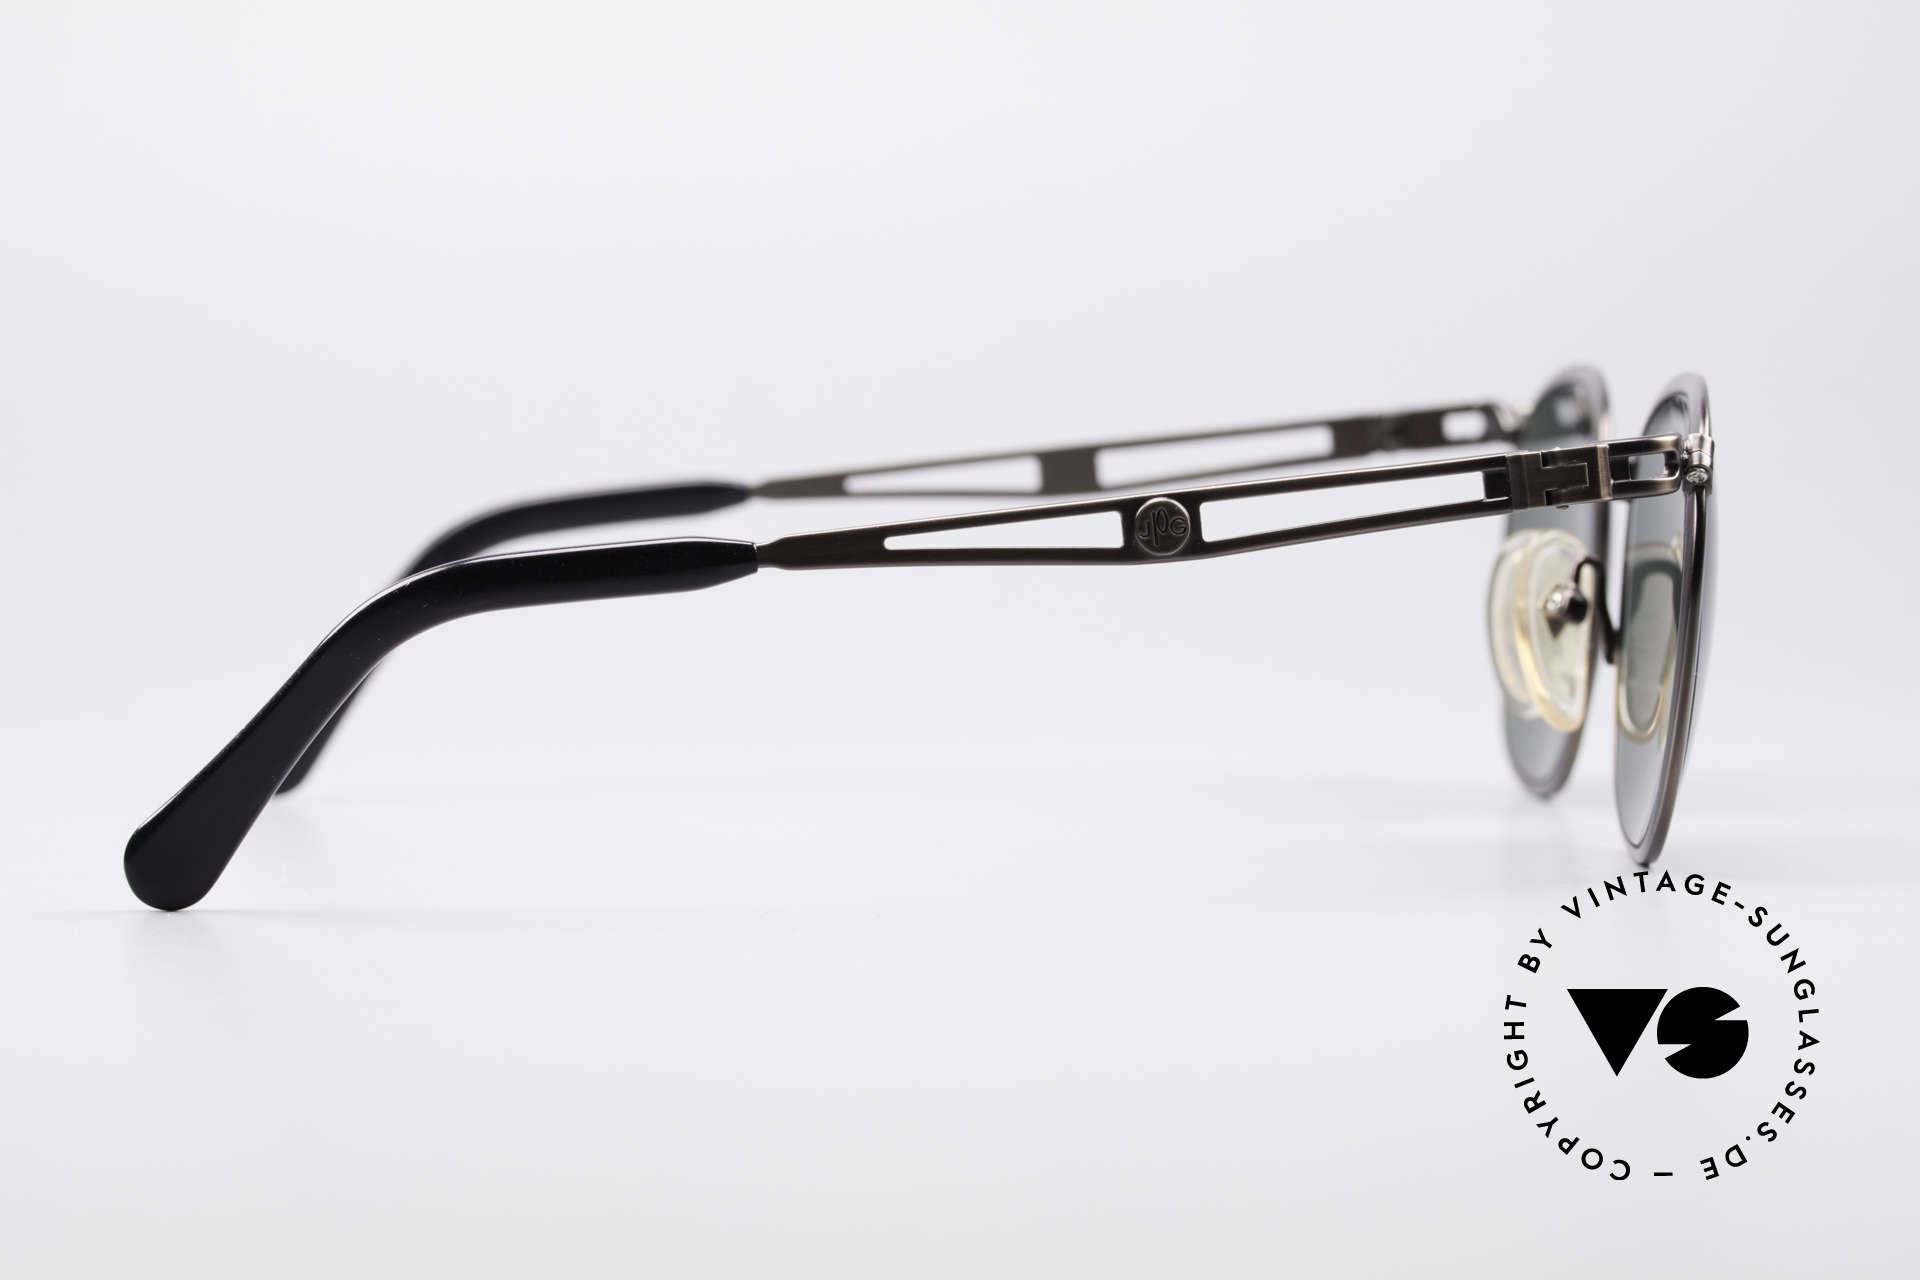 Jean Paul Gaultier 56-2177 Rare Designer Sunglasses, NO RETRO fashion, but a 25 years old ORIGINAL!, Made for Men and Women